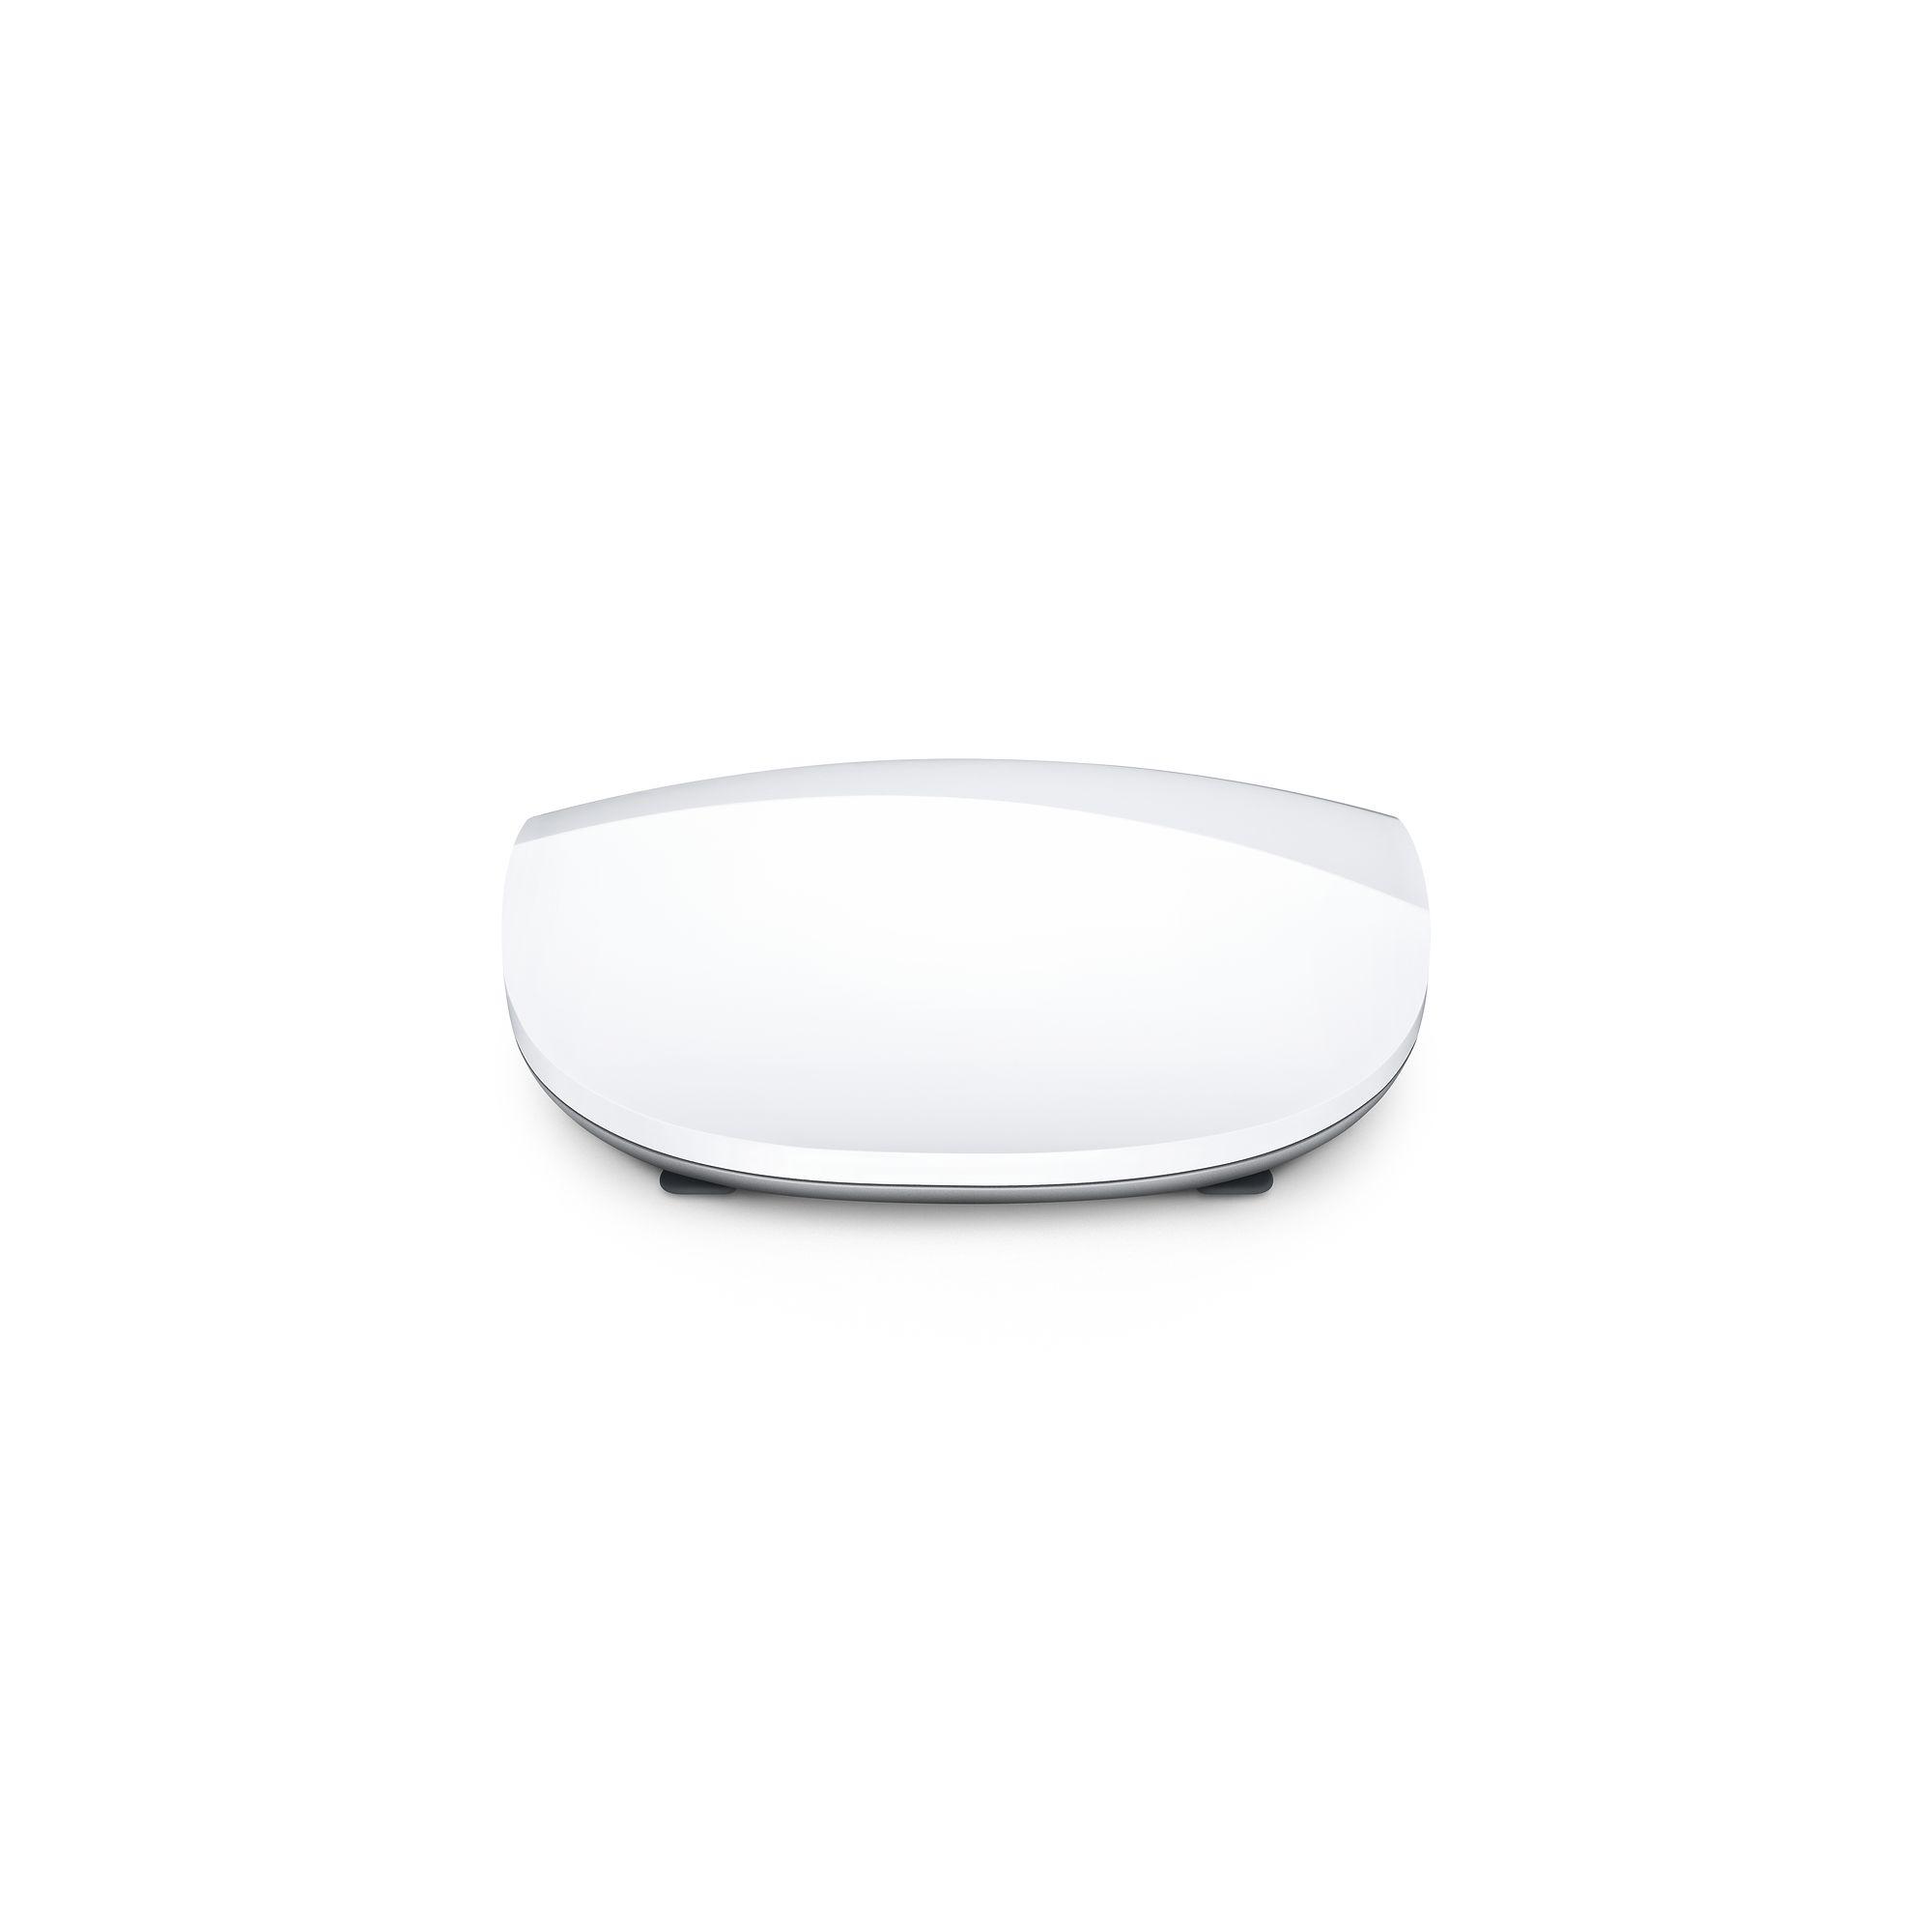 Apple Magic Mouse 2 - Wit - Zonder verpakking